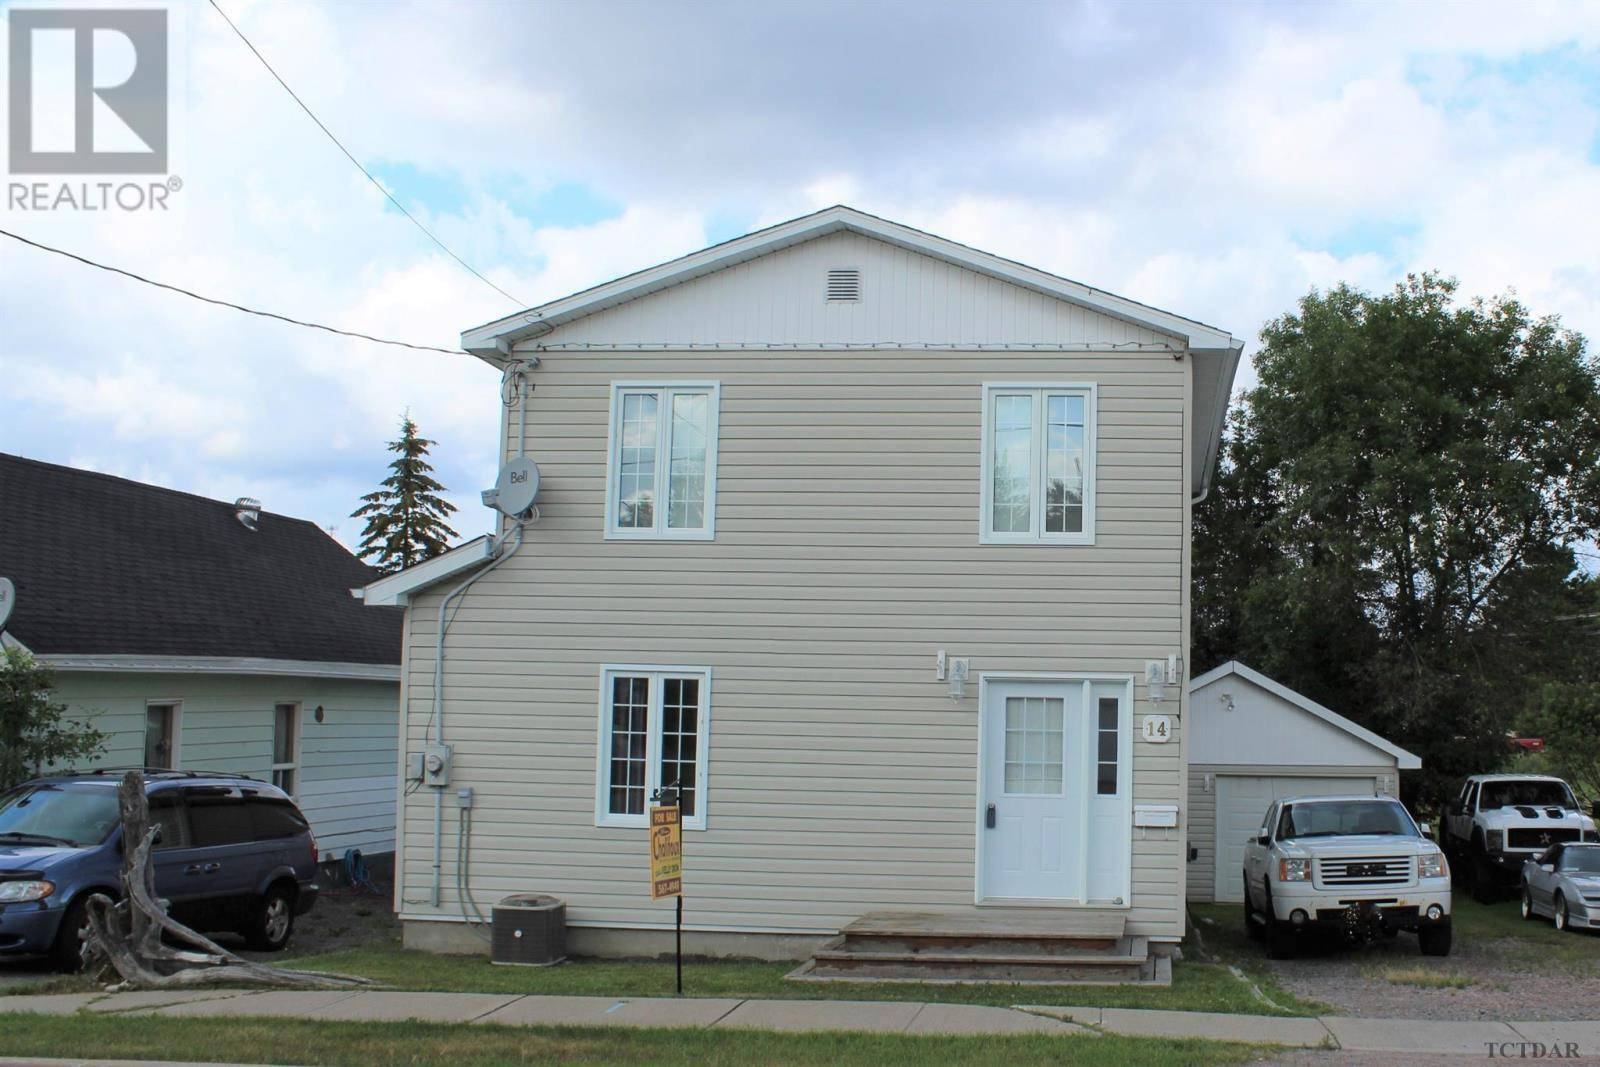 House for sale at 14 Premier Ave W Kirkland Lake Ontario - MLS: TM191867